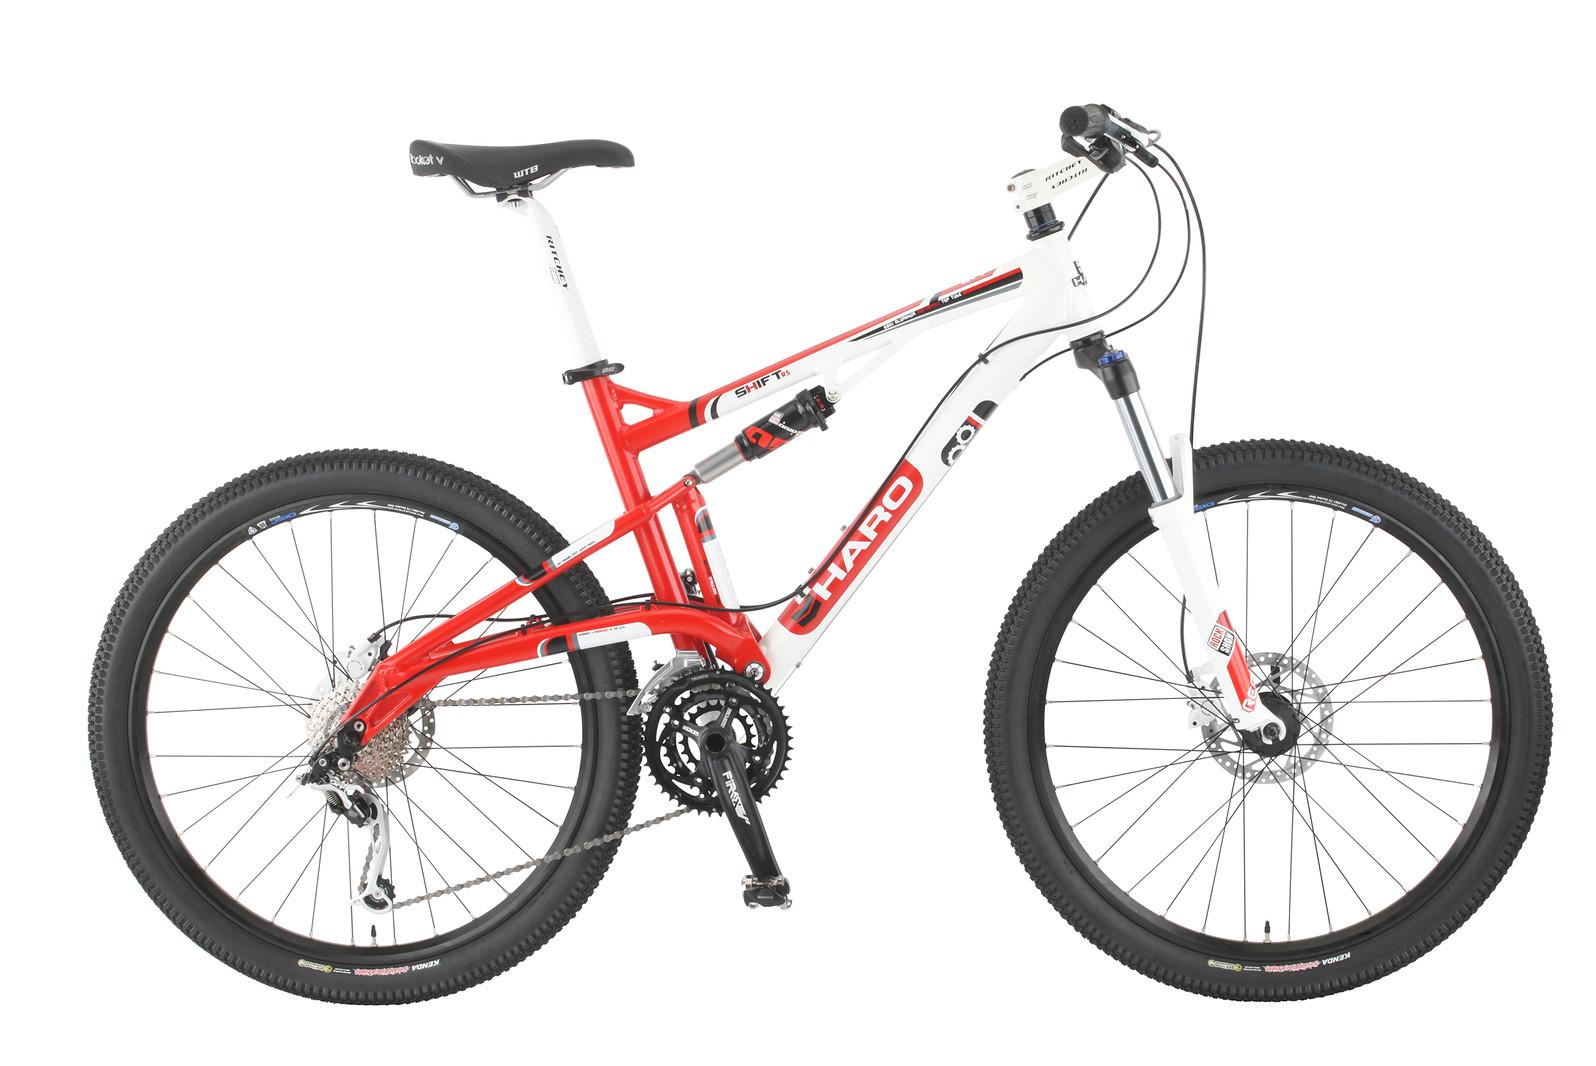 2011 Haro Shift R5 Bike